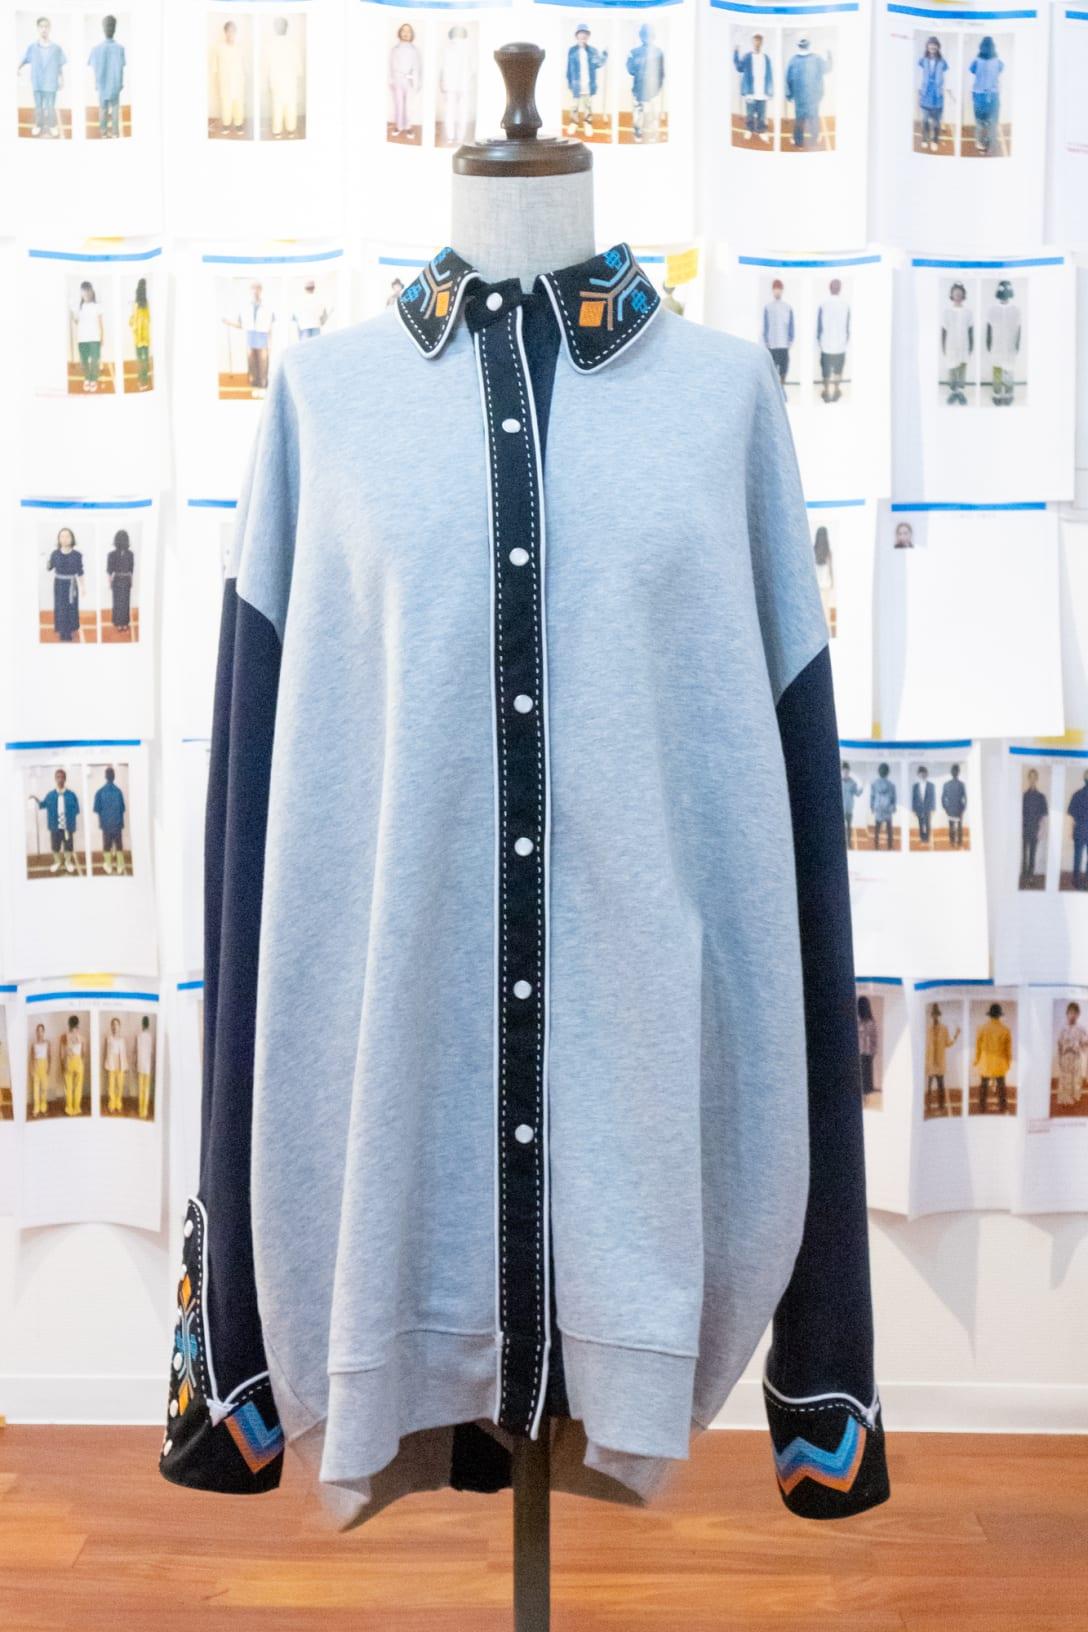 miletが着用していたスウェットシャツ Image by FASHIONSNAP